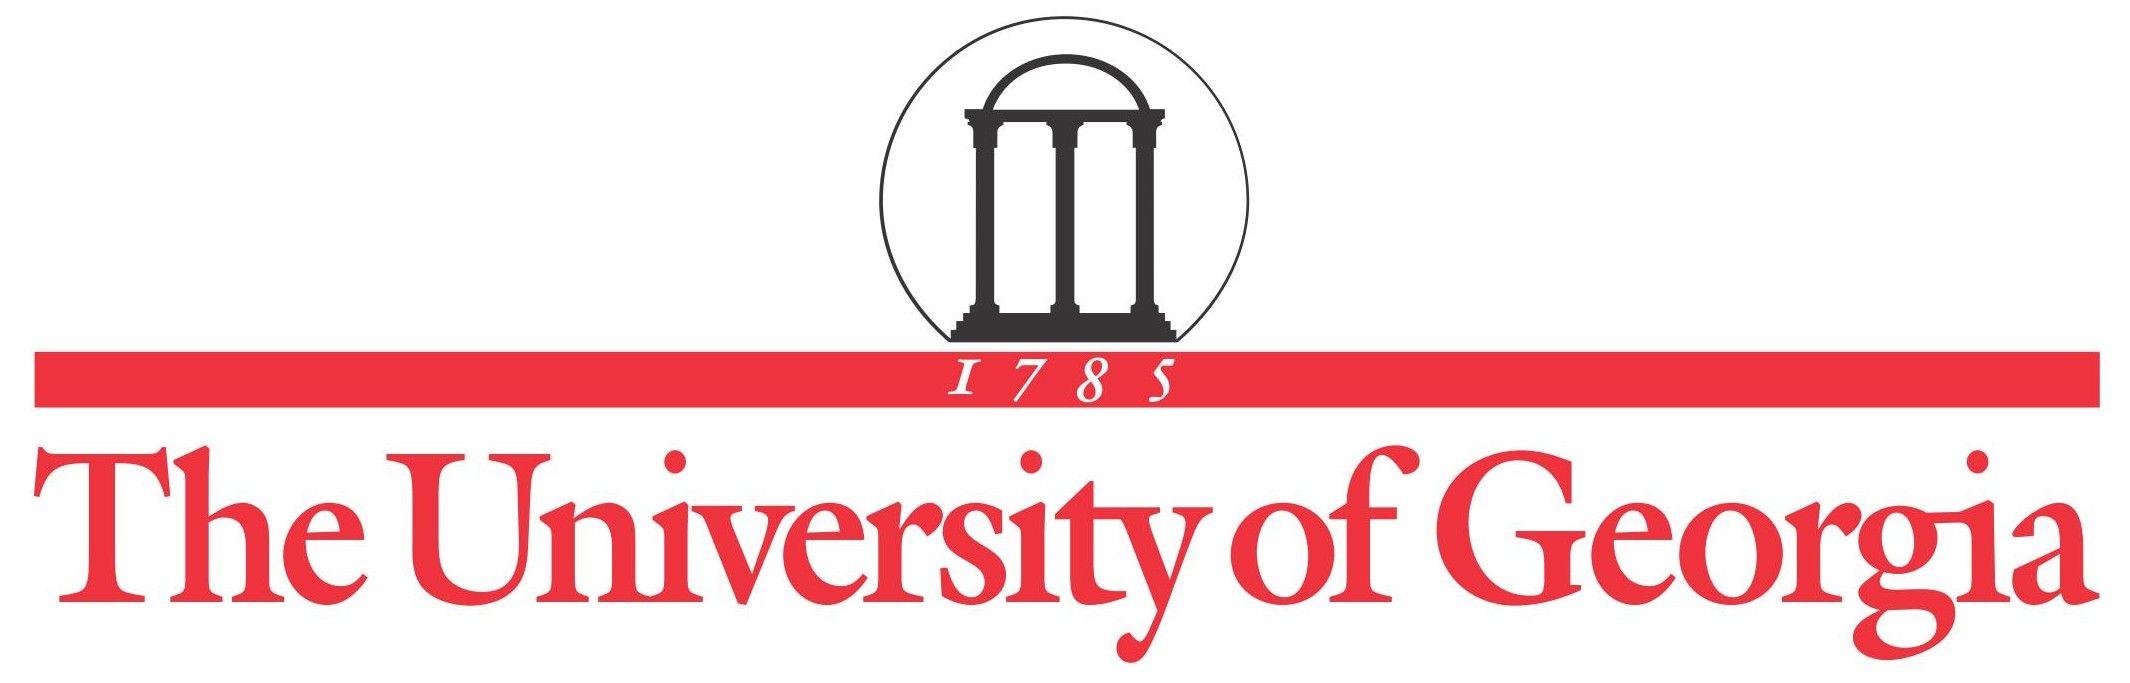 Uga University Of Georgia Logo And Seal University Of Georgia University Logo Admissions Essay